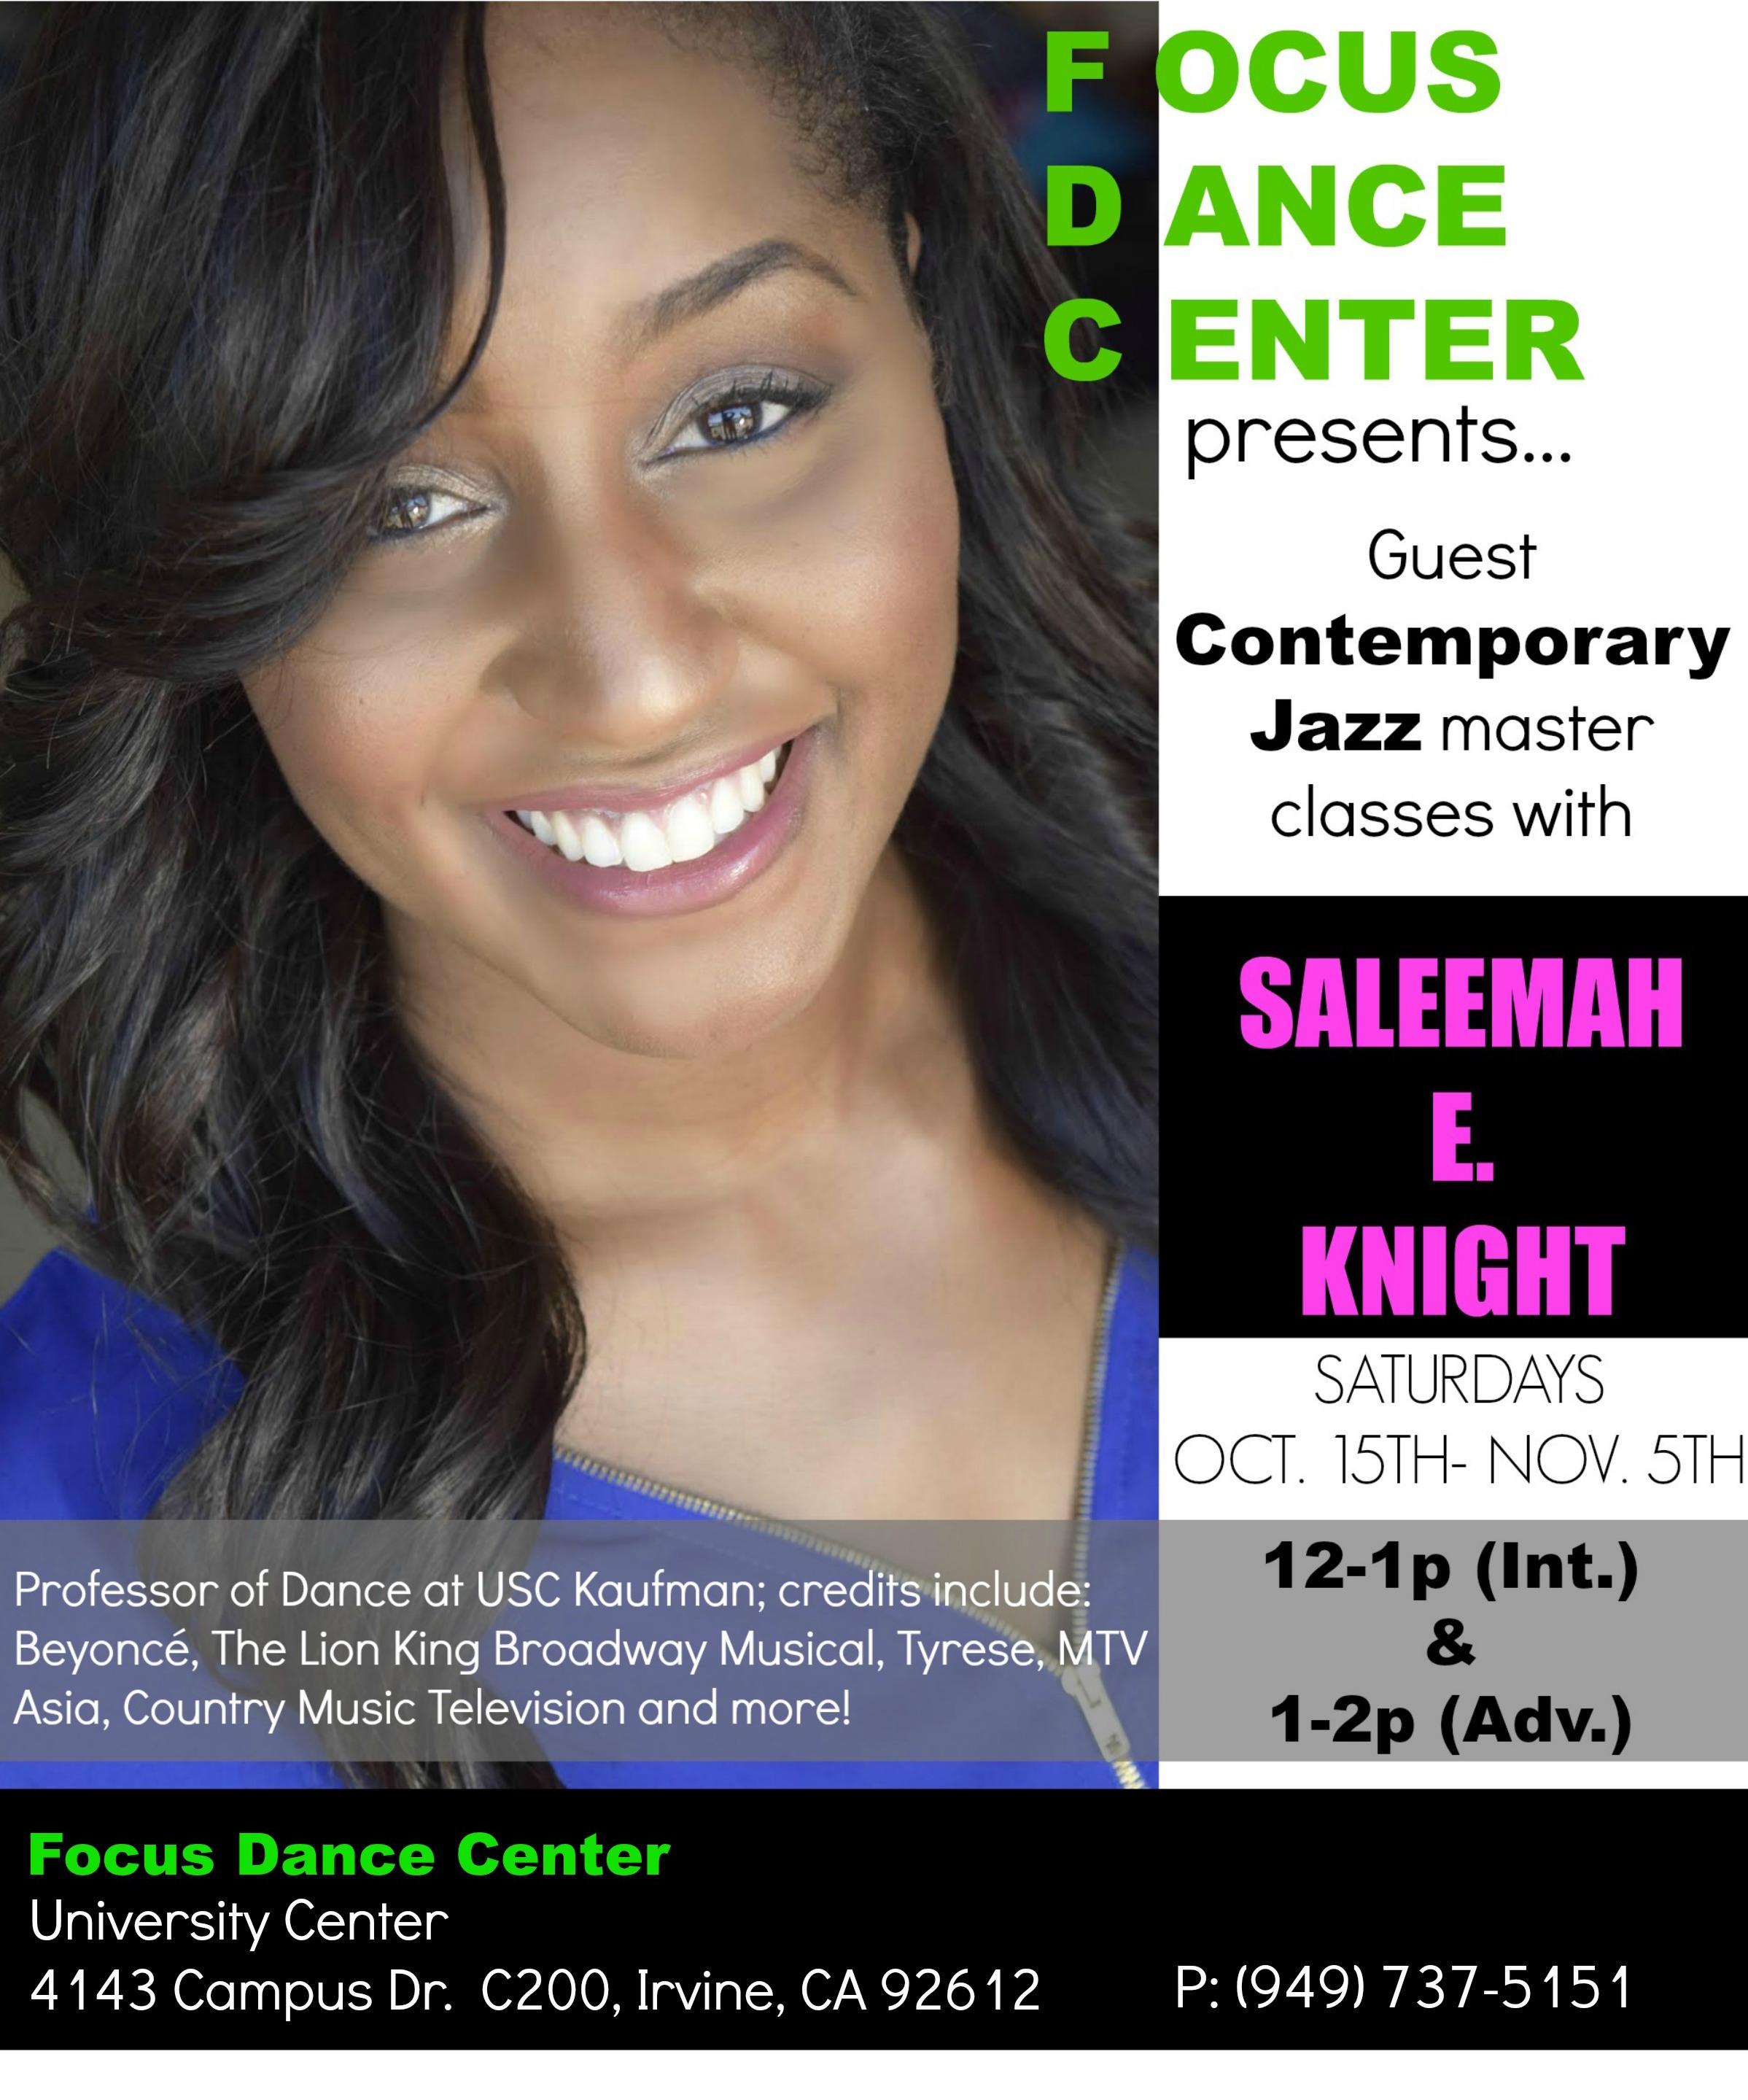 Saleemah E. Knight Guest Contemporary Jazz Master Classes